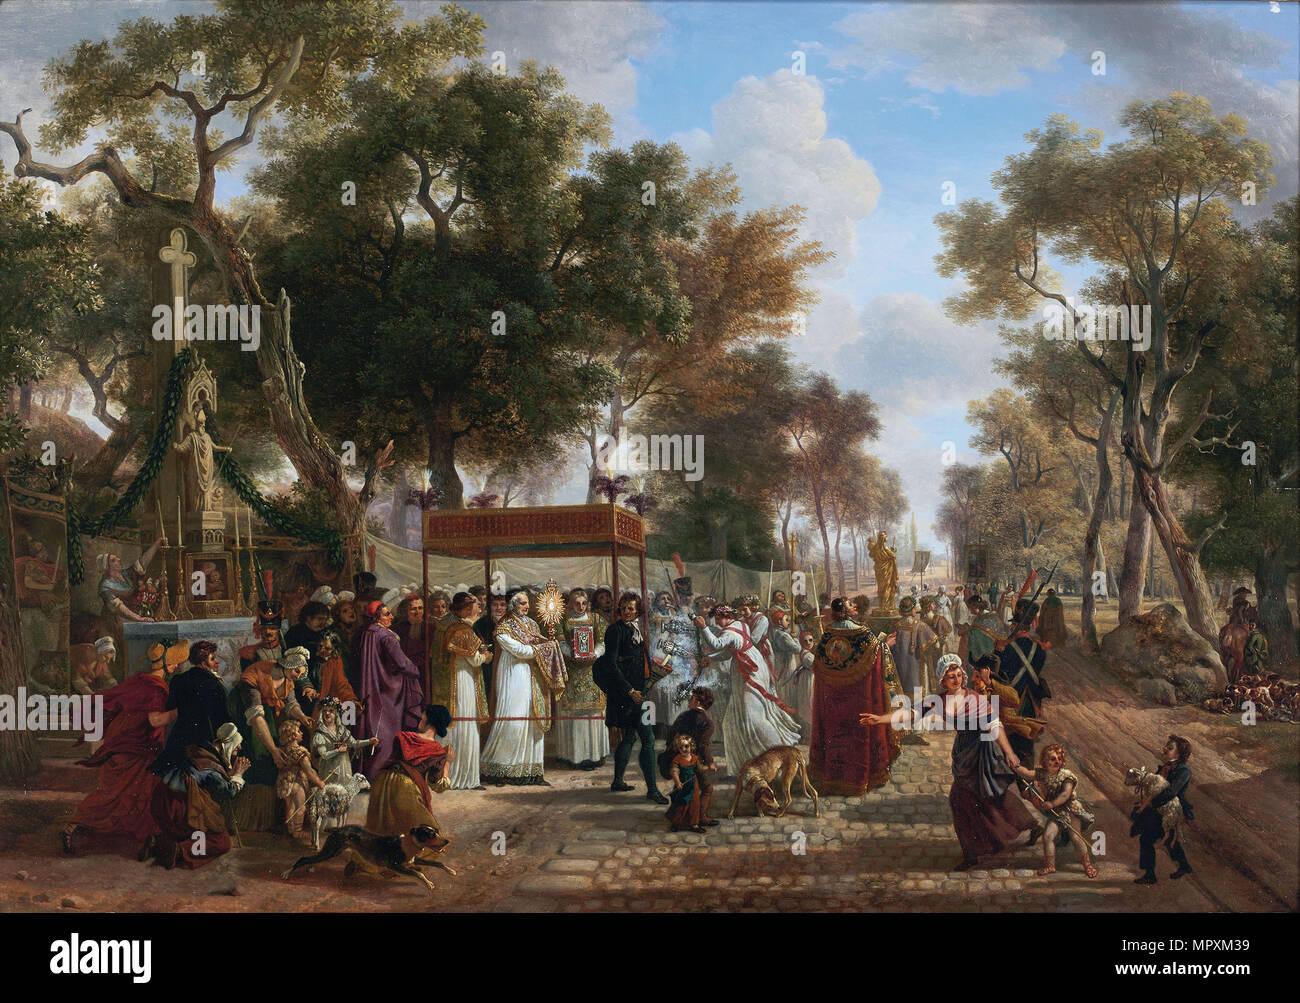 The Corpus Christi procession in a village. - Stock Image